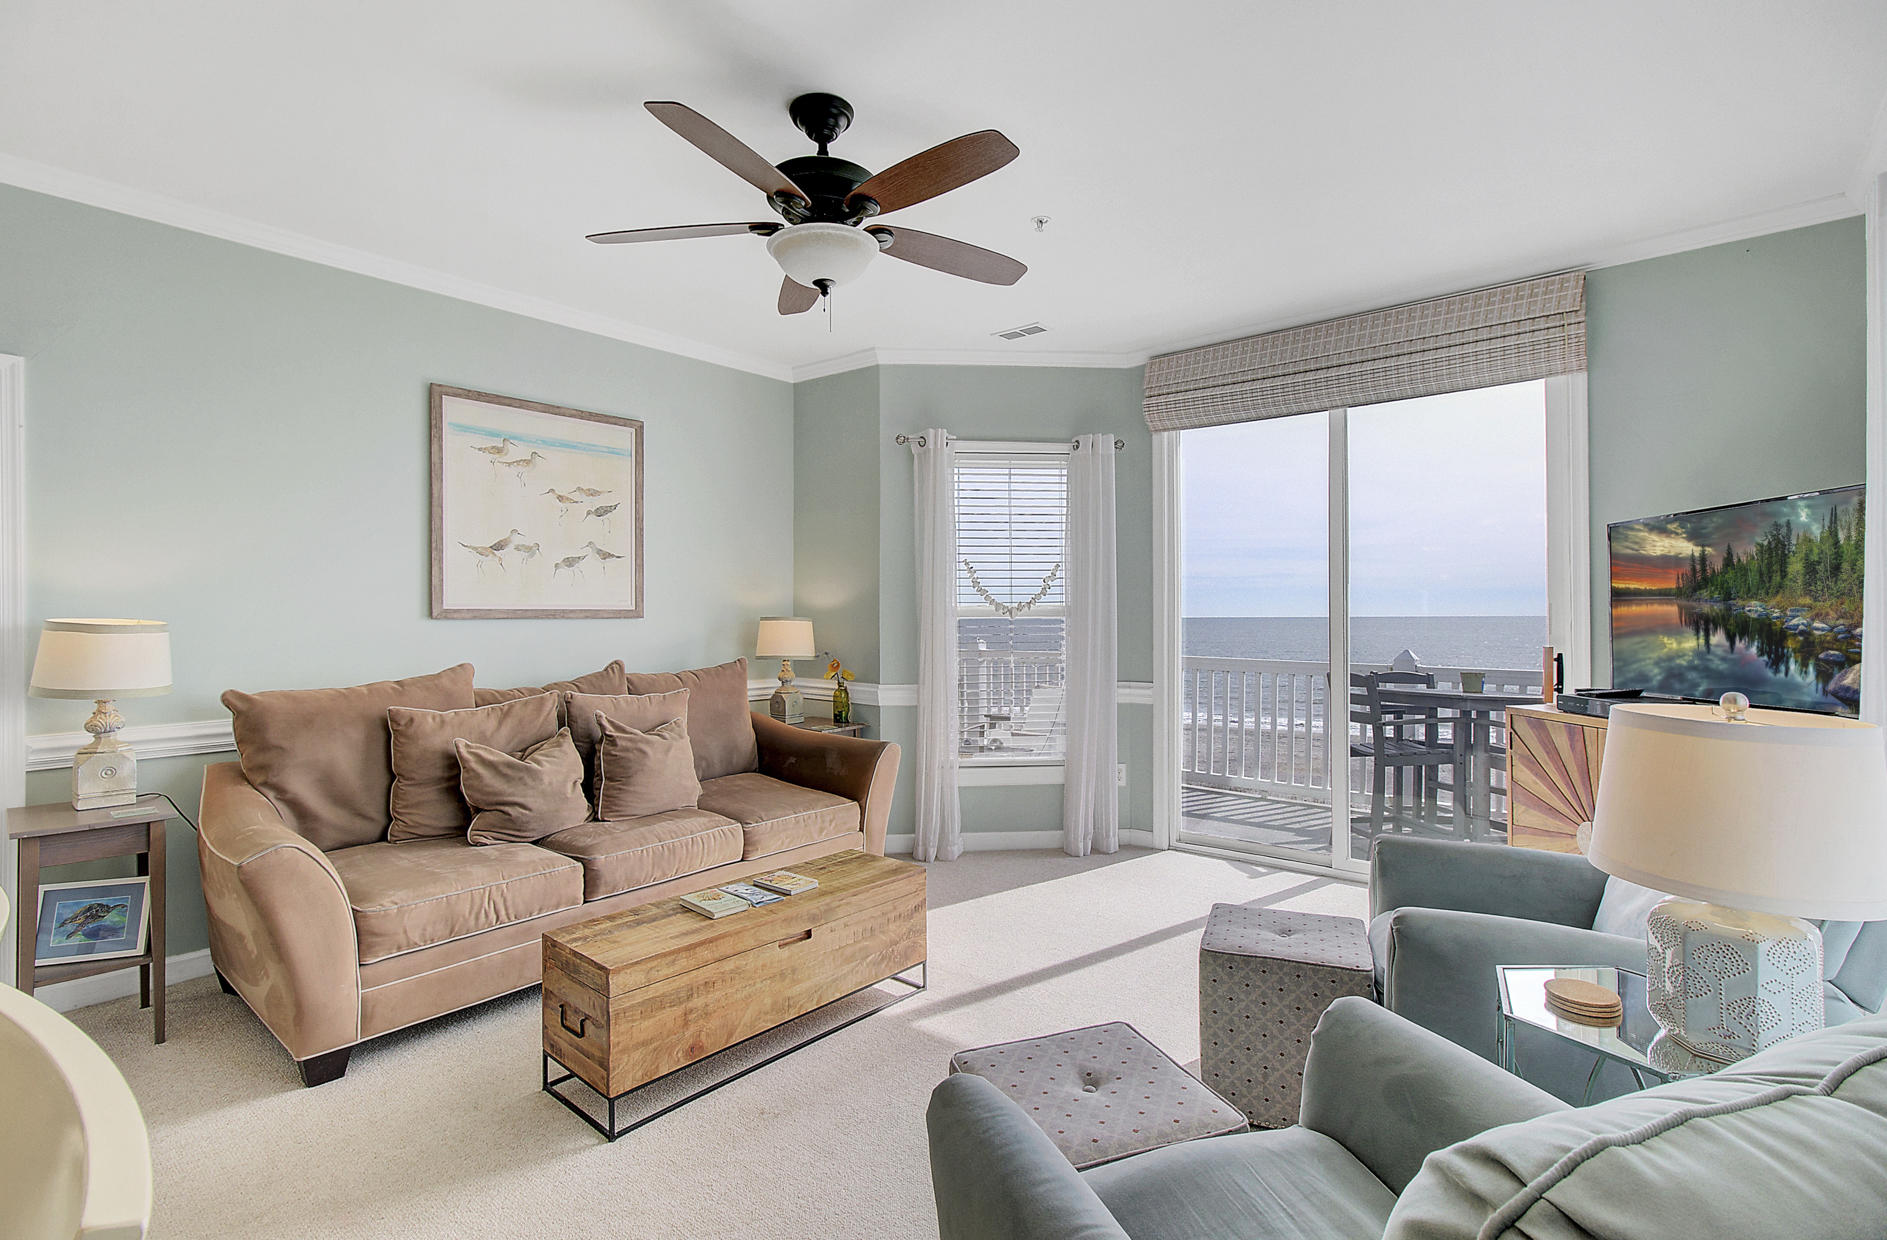 Seaside Villas I Homes For Sale - 111 Arctic, Folly Beach, SC - 3